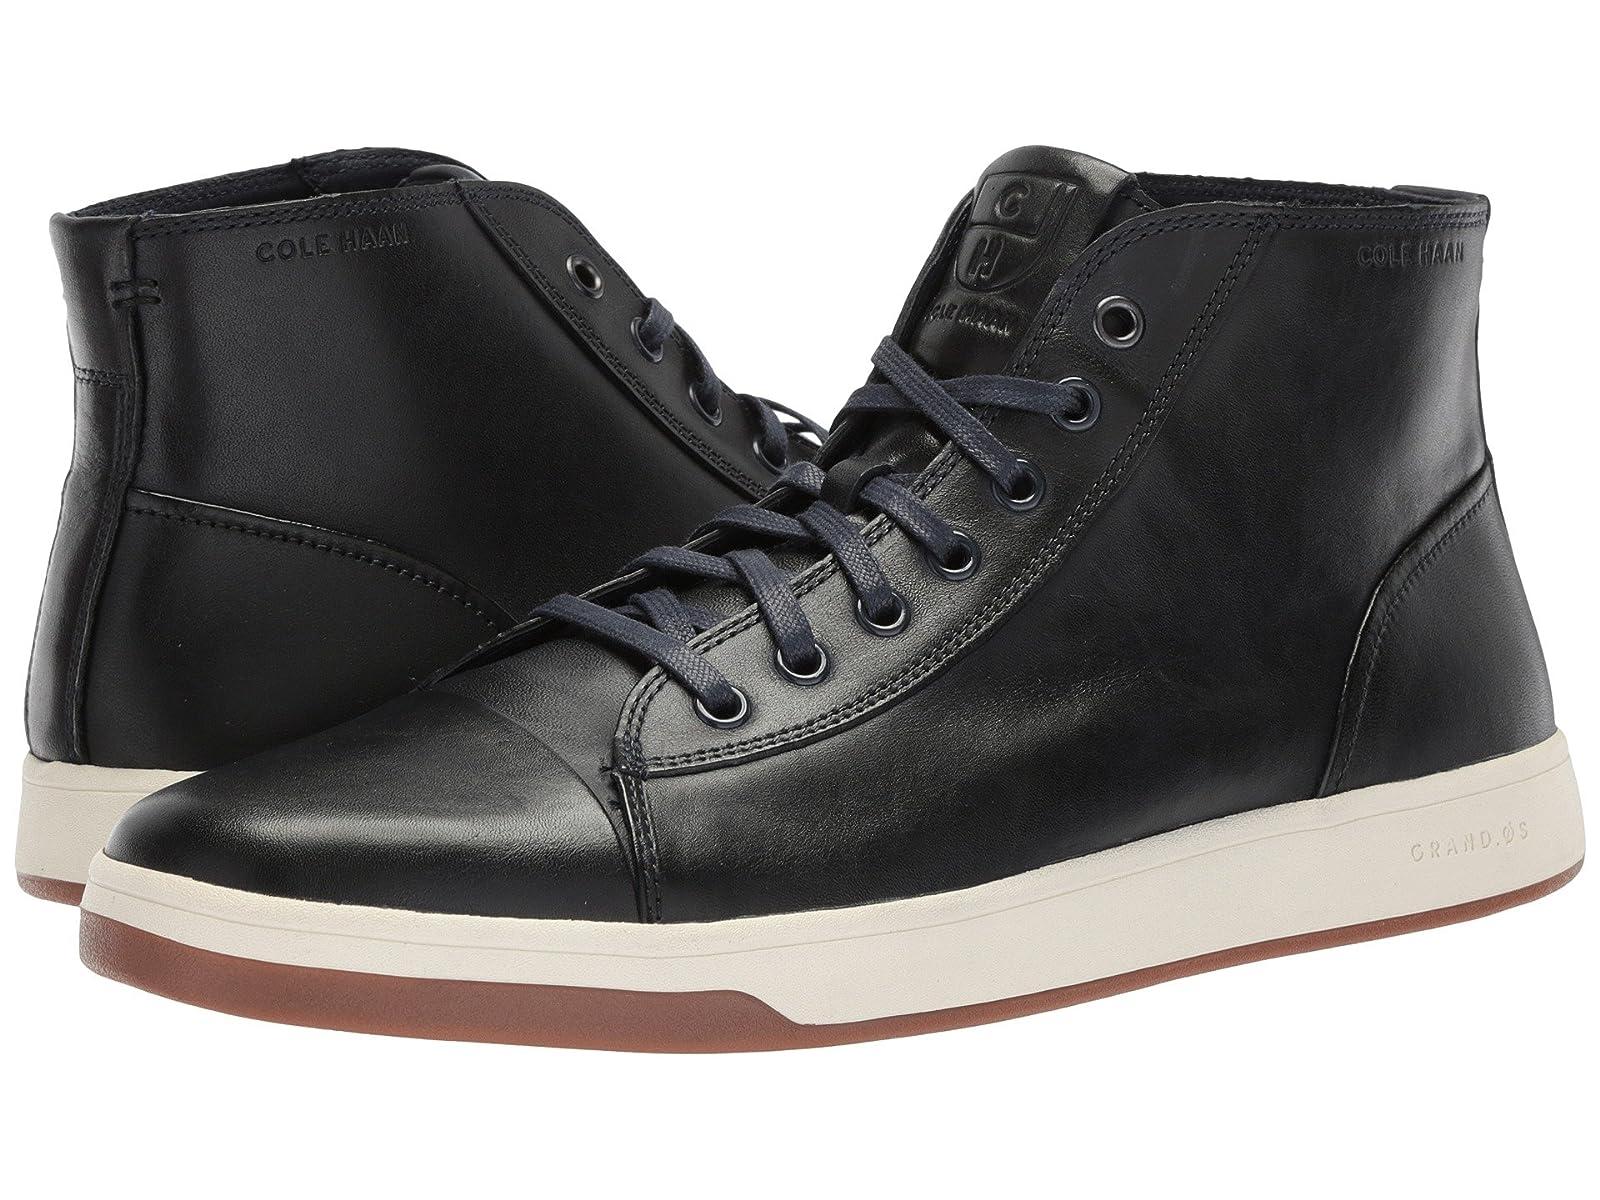 Cole Haan Grandpro Spectator MidAtmospheric grades have affordable shoes